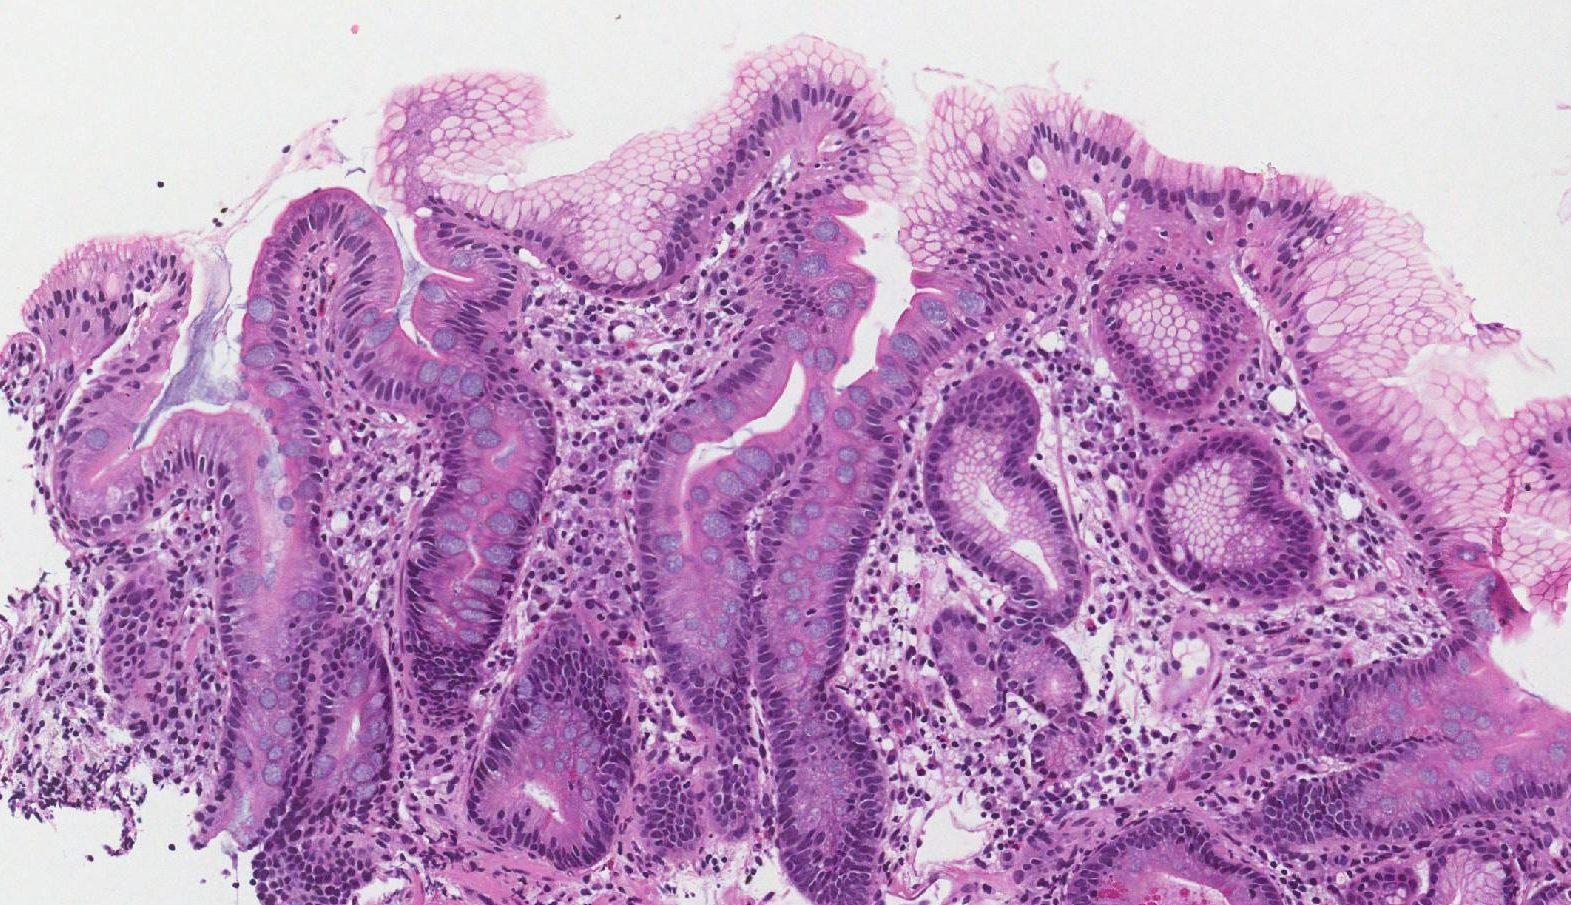 intestinal metaplasia